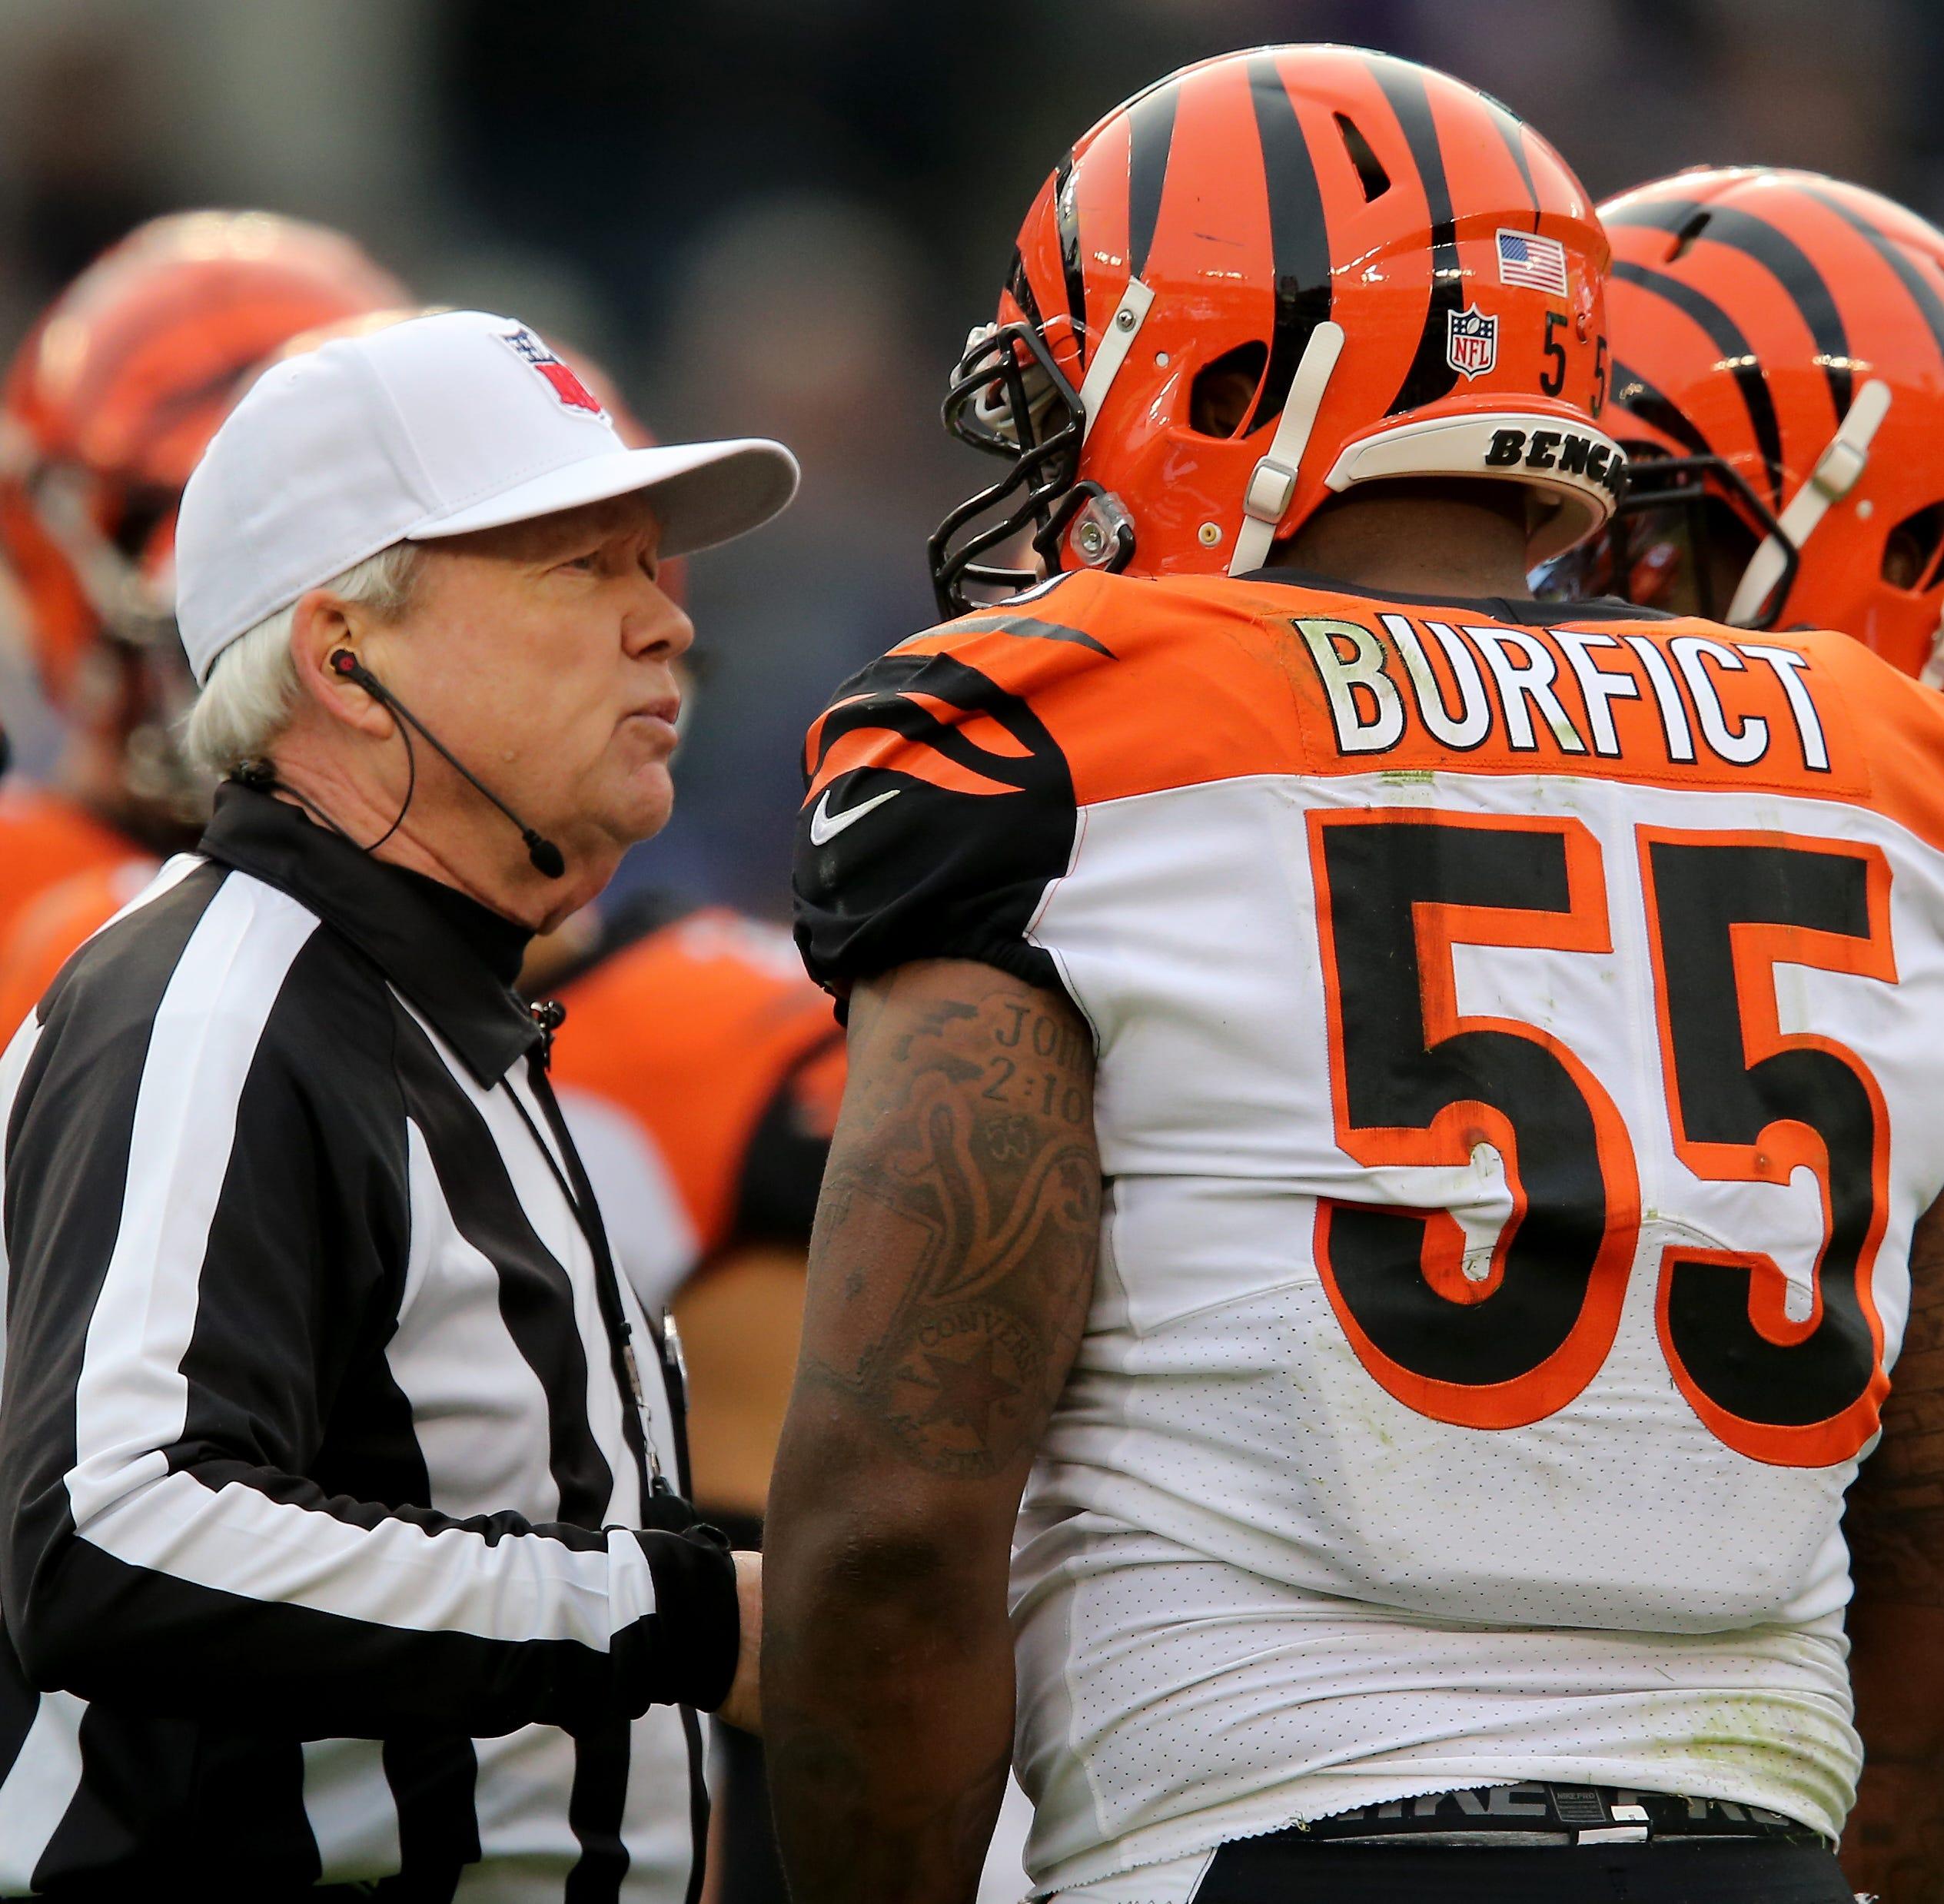 Watch: Baltimore Ravens' Marshal Yanda spits at Bengals' Vontaze Burfict